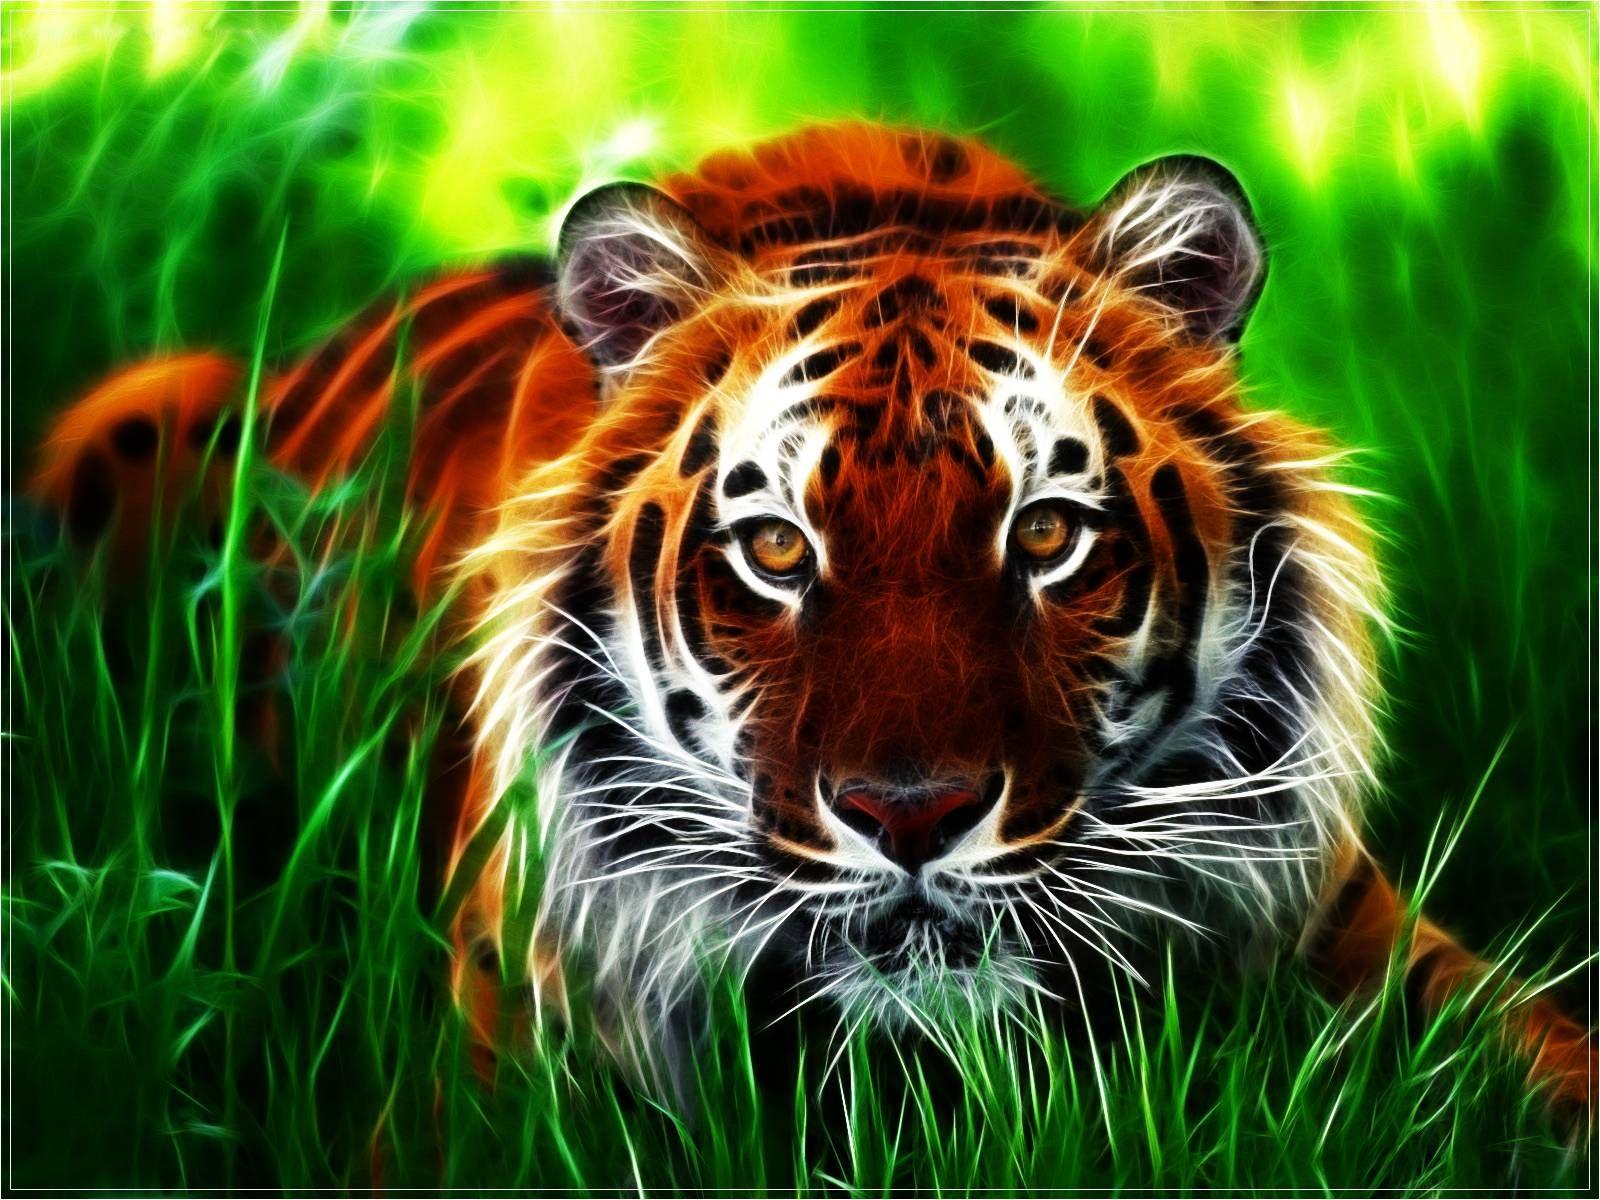 Tiger   Zeichnung Tiger wallpaper Tiger pictures Animal wallpaper 1600x1200